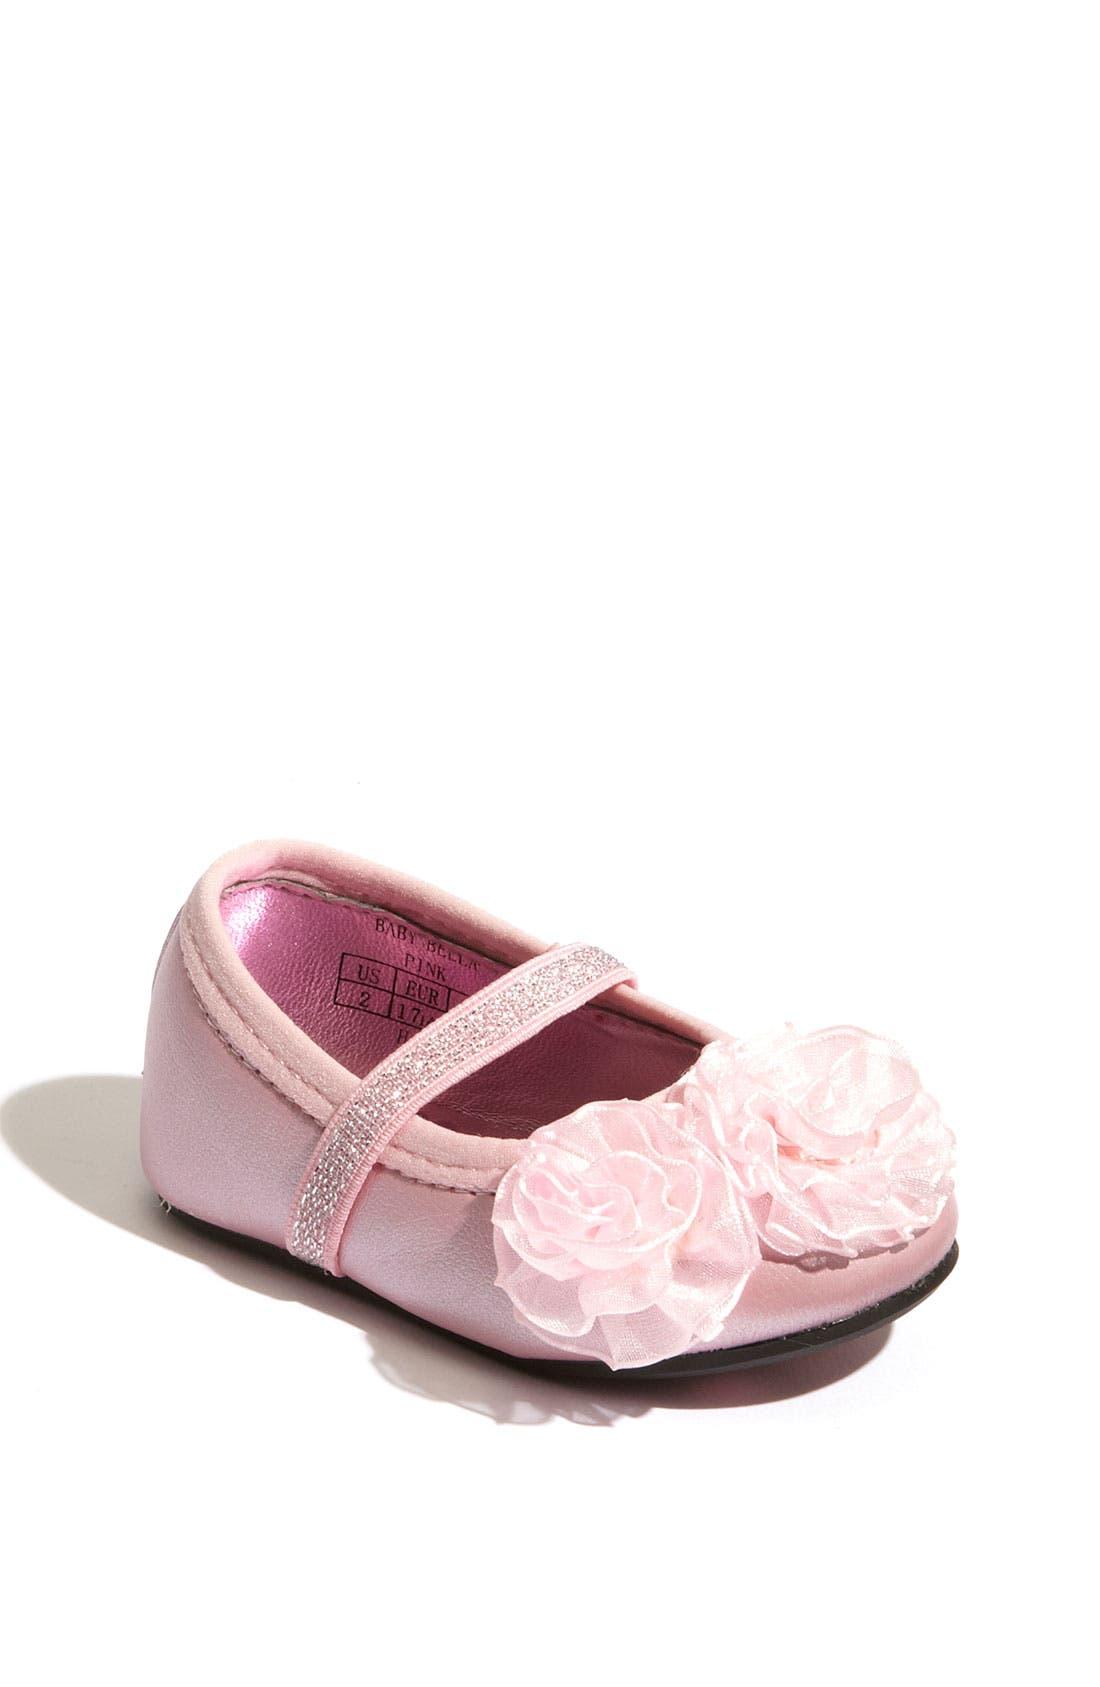 Alternate Image 1 Selected - Stuart Weitzman 'Baby Bella' Crib Shoe (Baby)